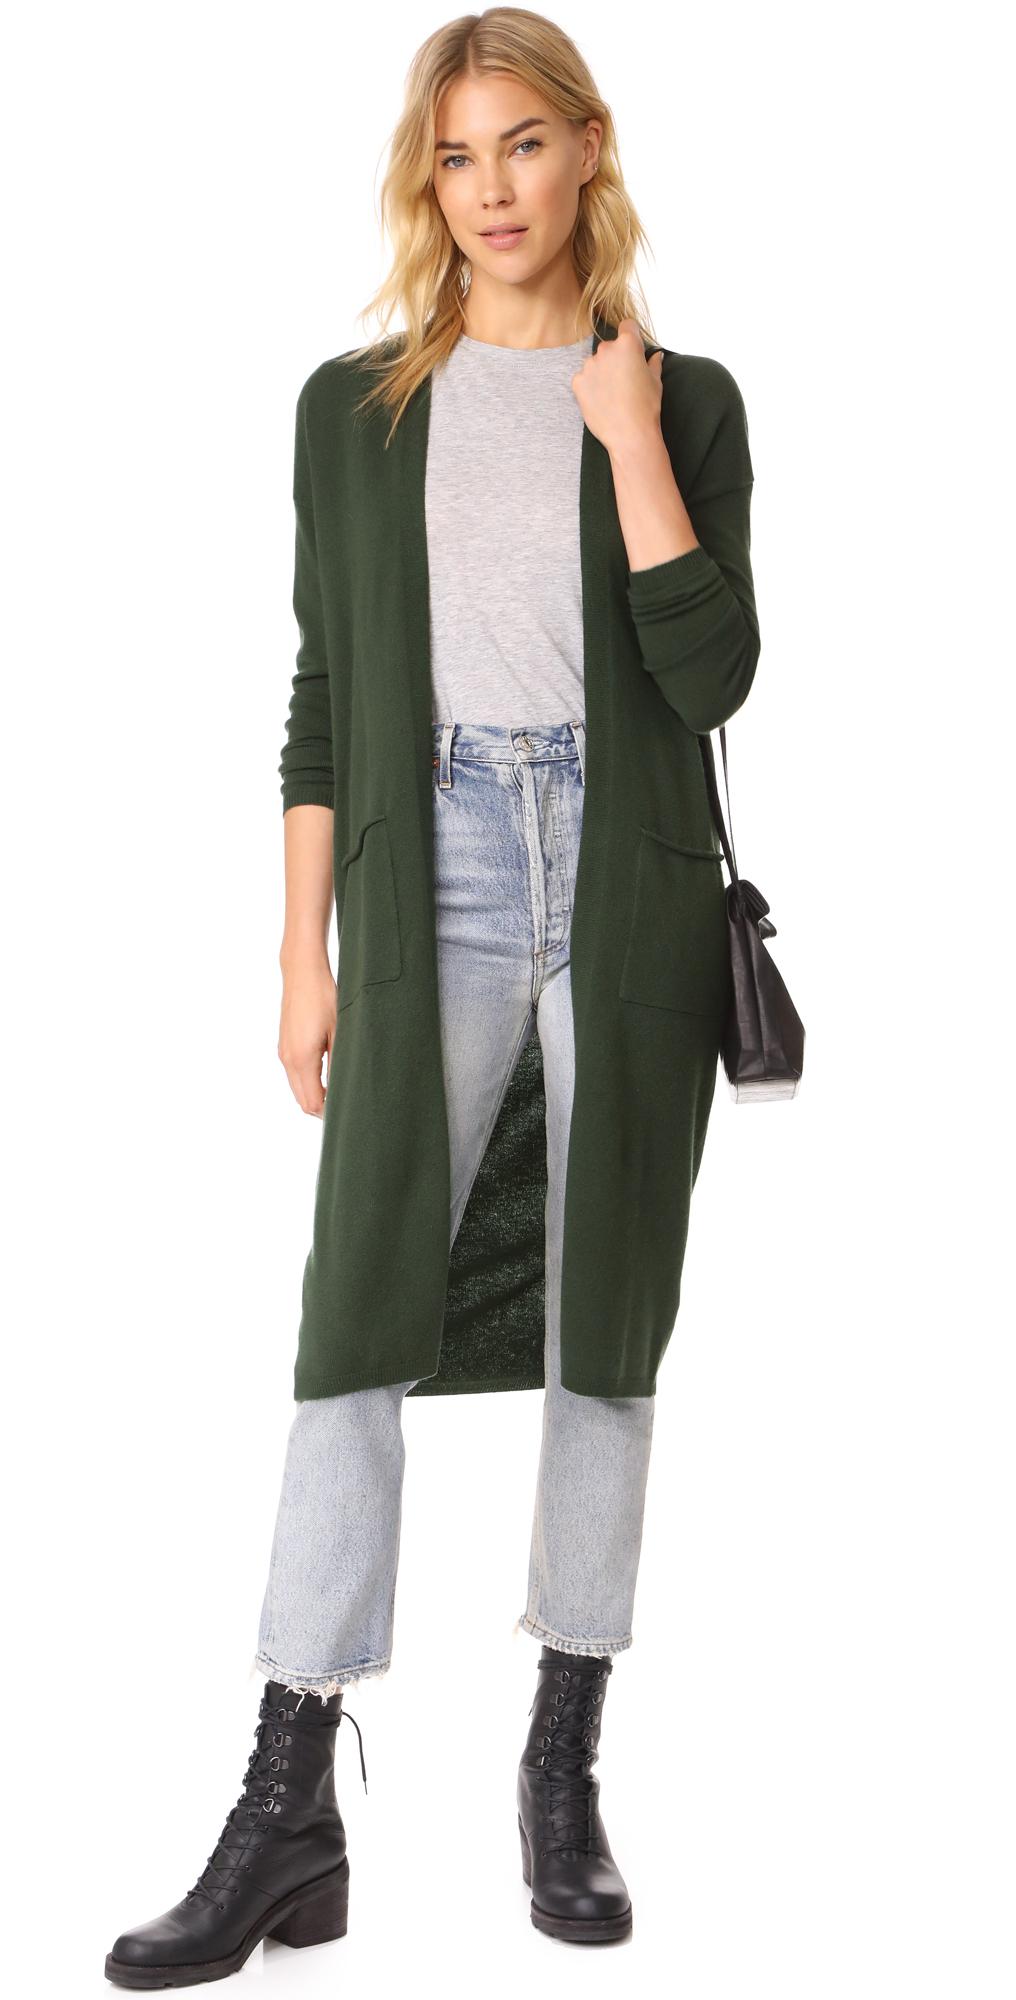 Shopbop Bop Basics Cashmere Duster Sweater Coat